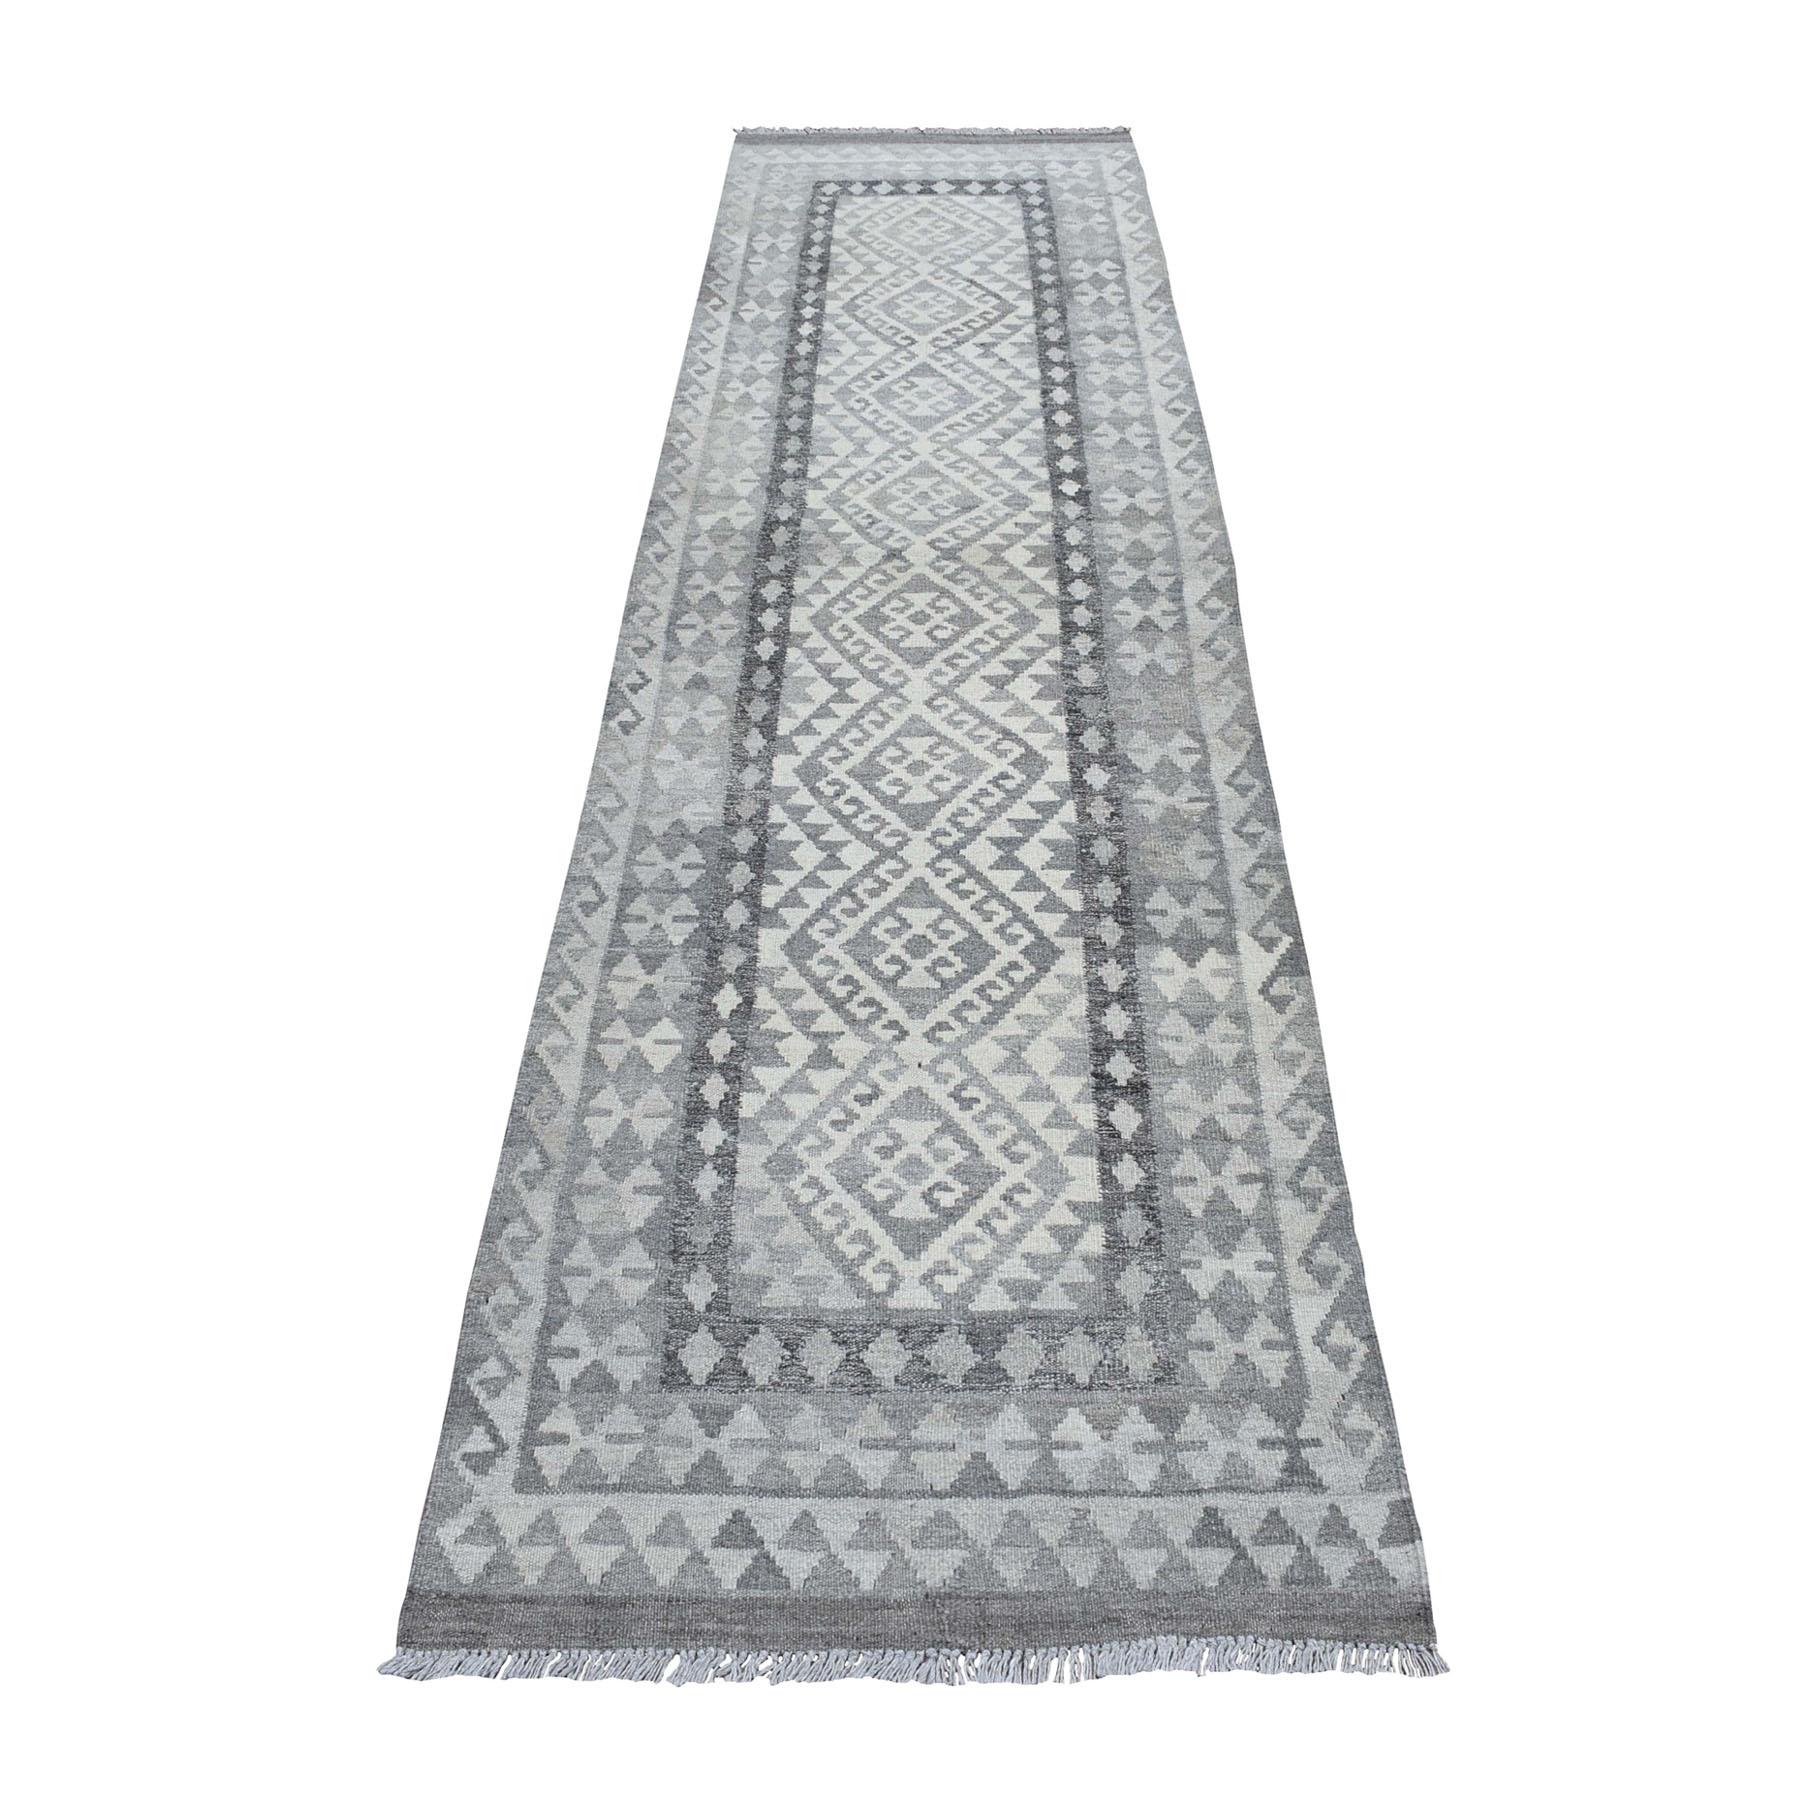 "2'10""x10' Undyed Natural Wool Afghan Kilim Reversible Hand Woven Runner Oriental Rug 53085"